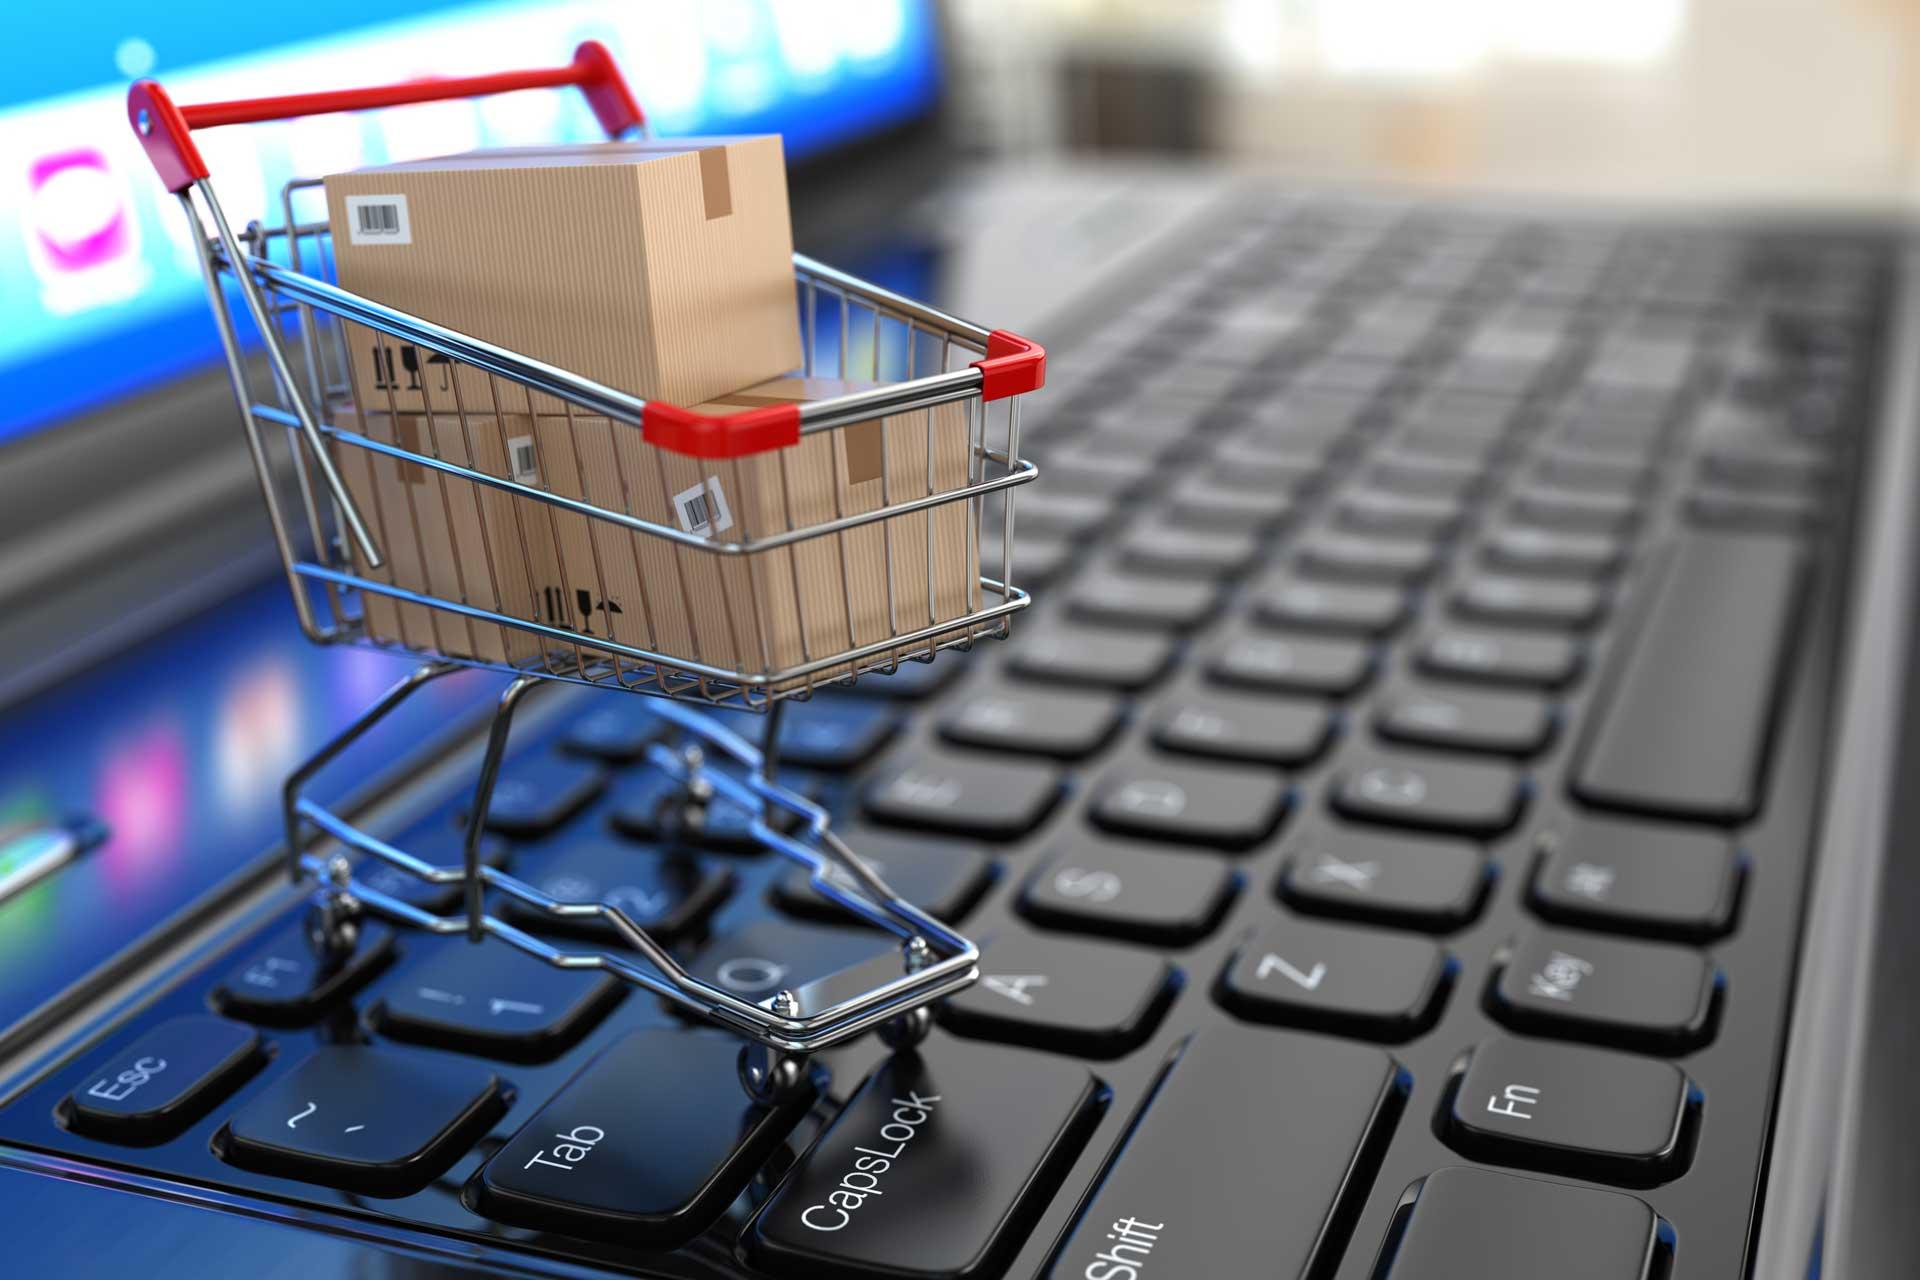 Iniciar un eCommerce con un hosting de calidad